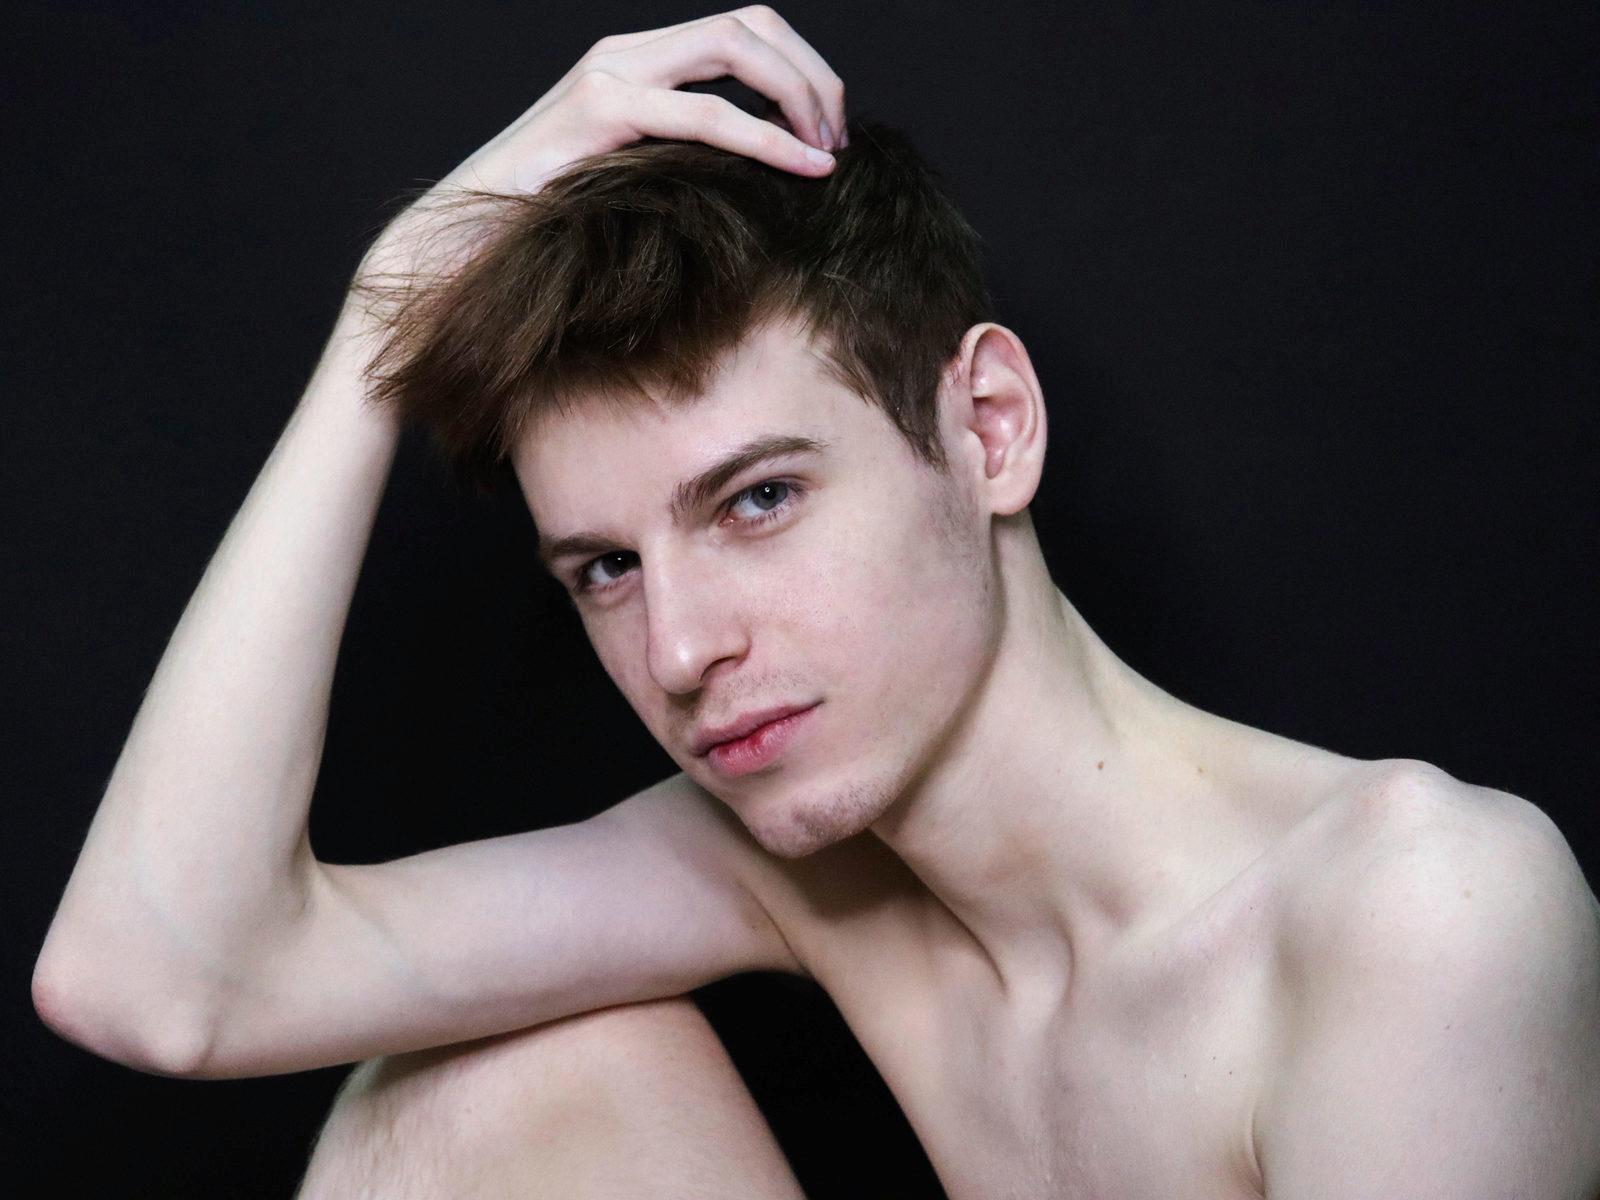 Aron Sandler